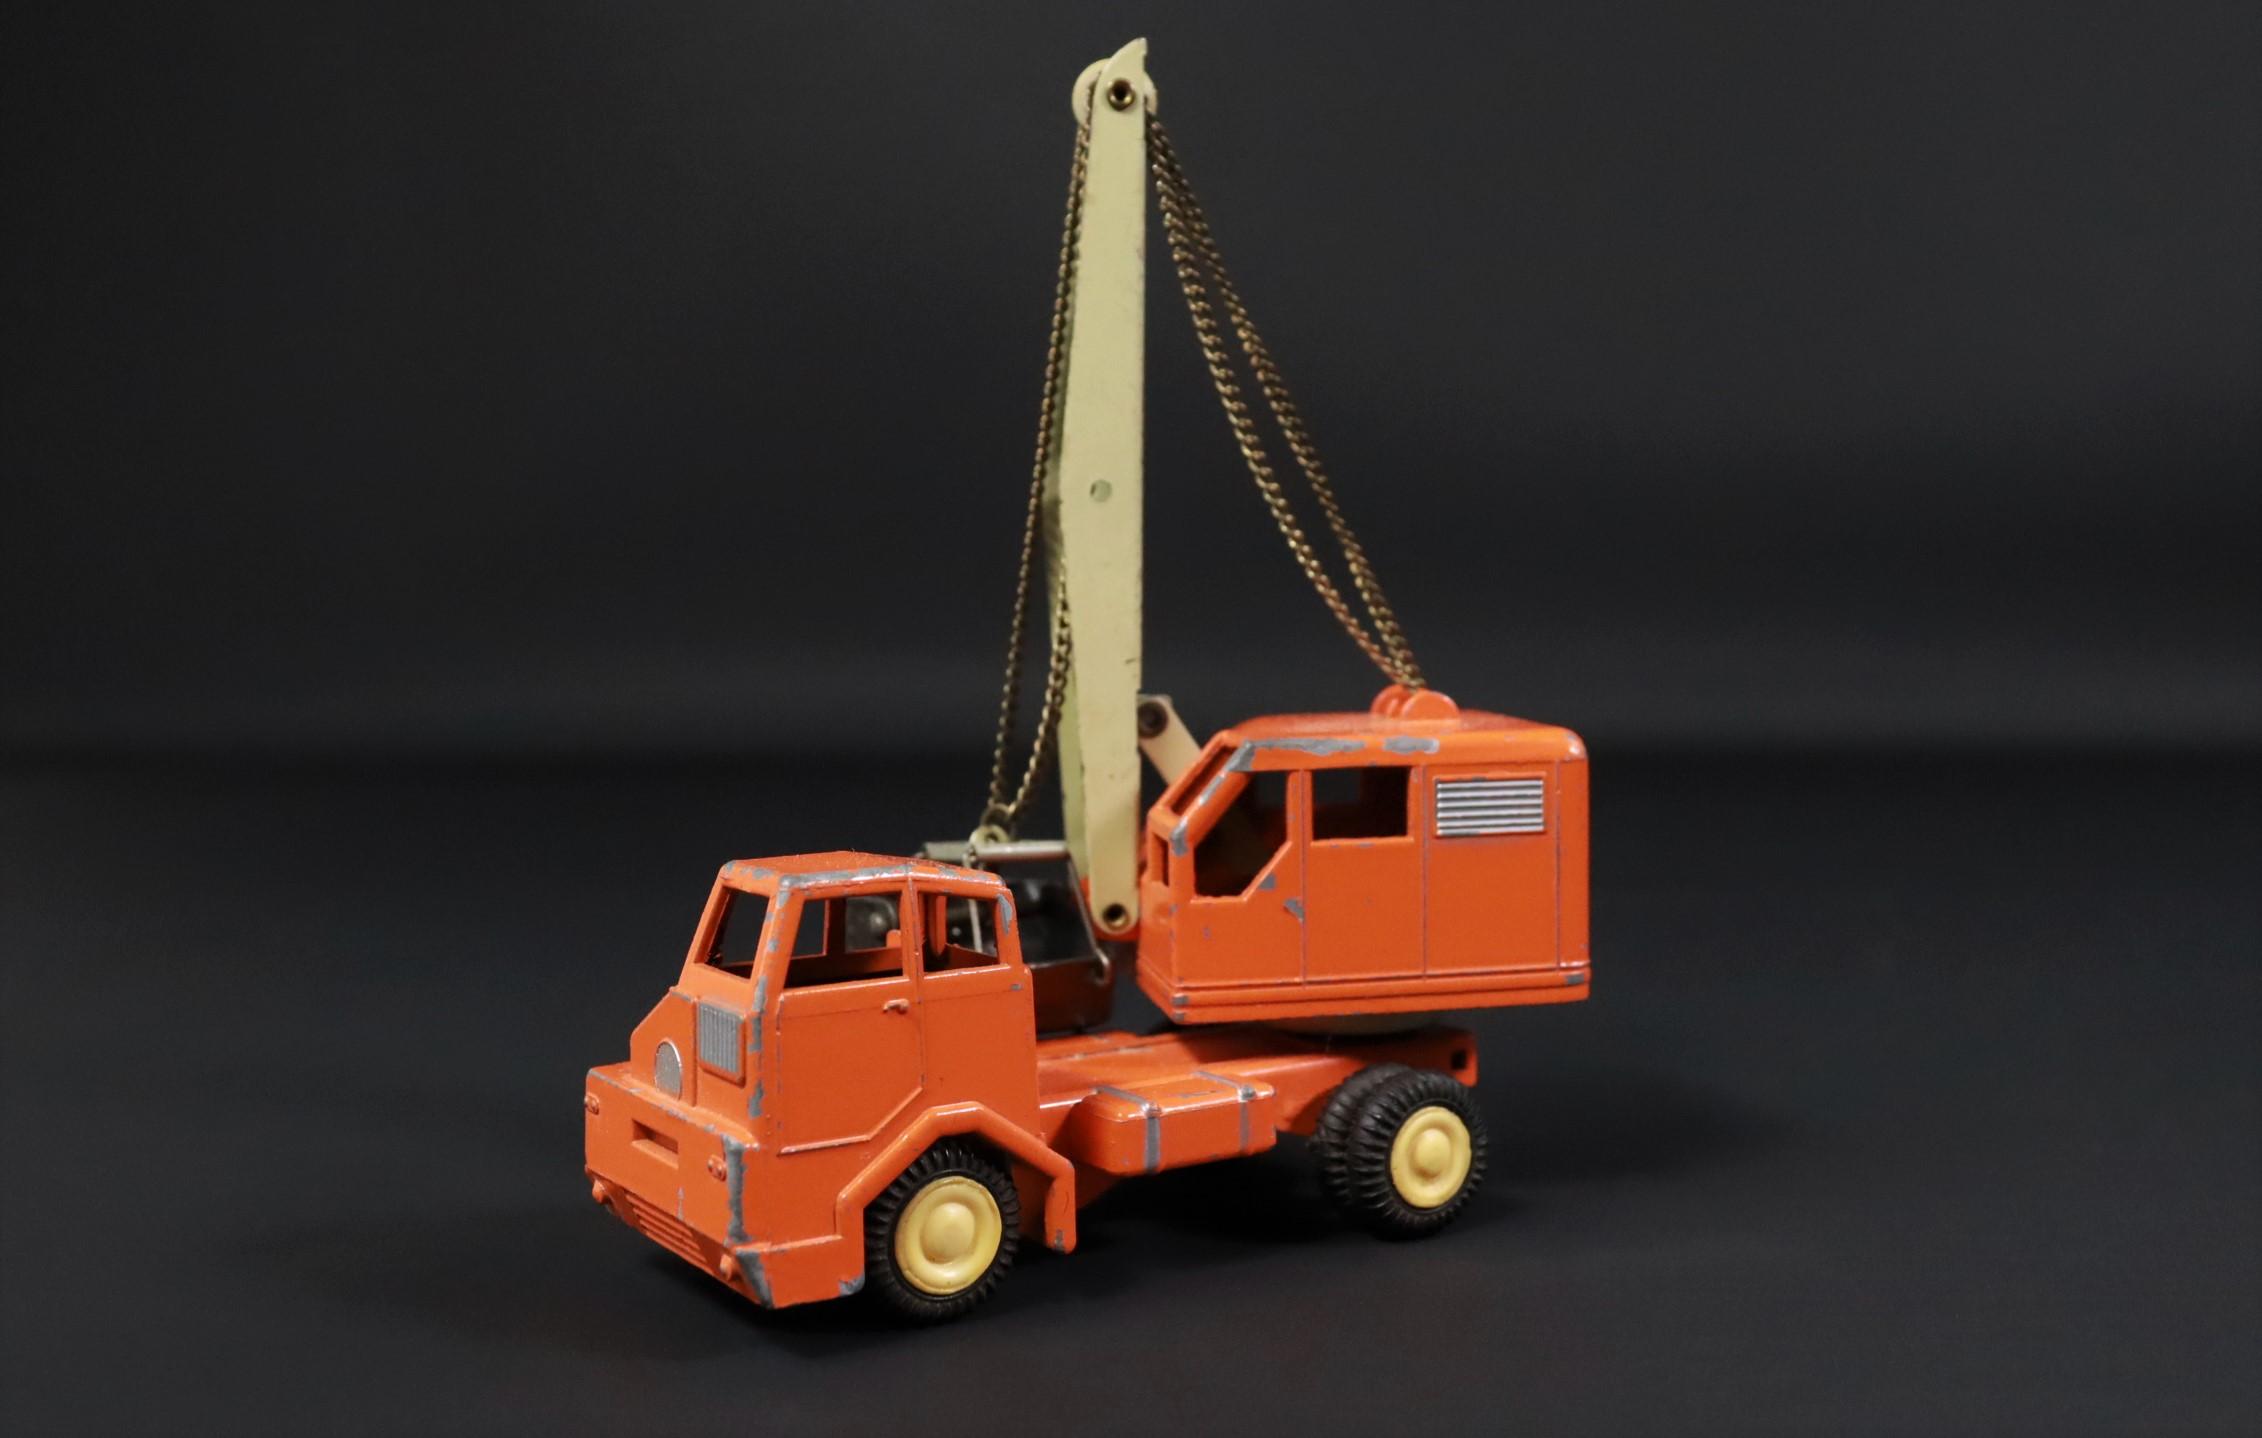 Gama / Kranwagen / LKW / orange / Modellauto #U2 2